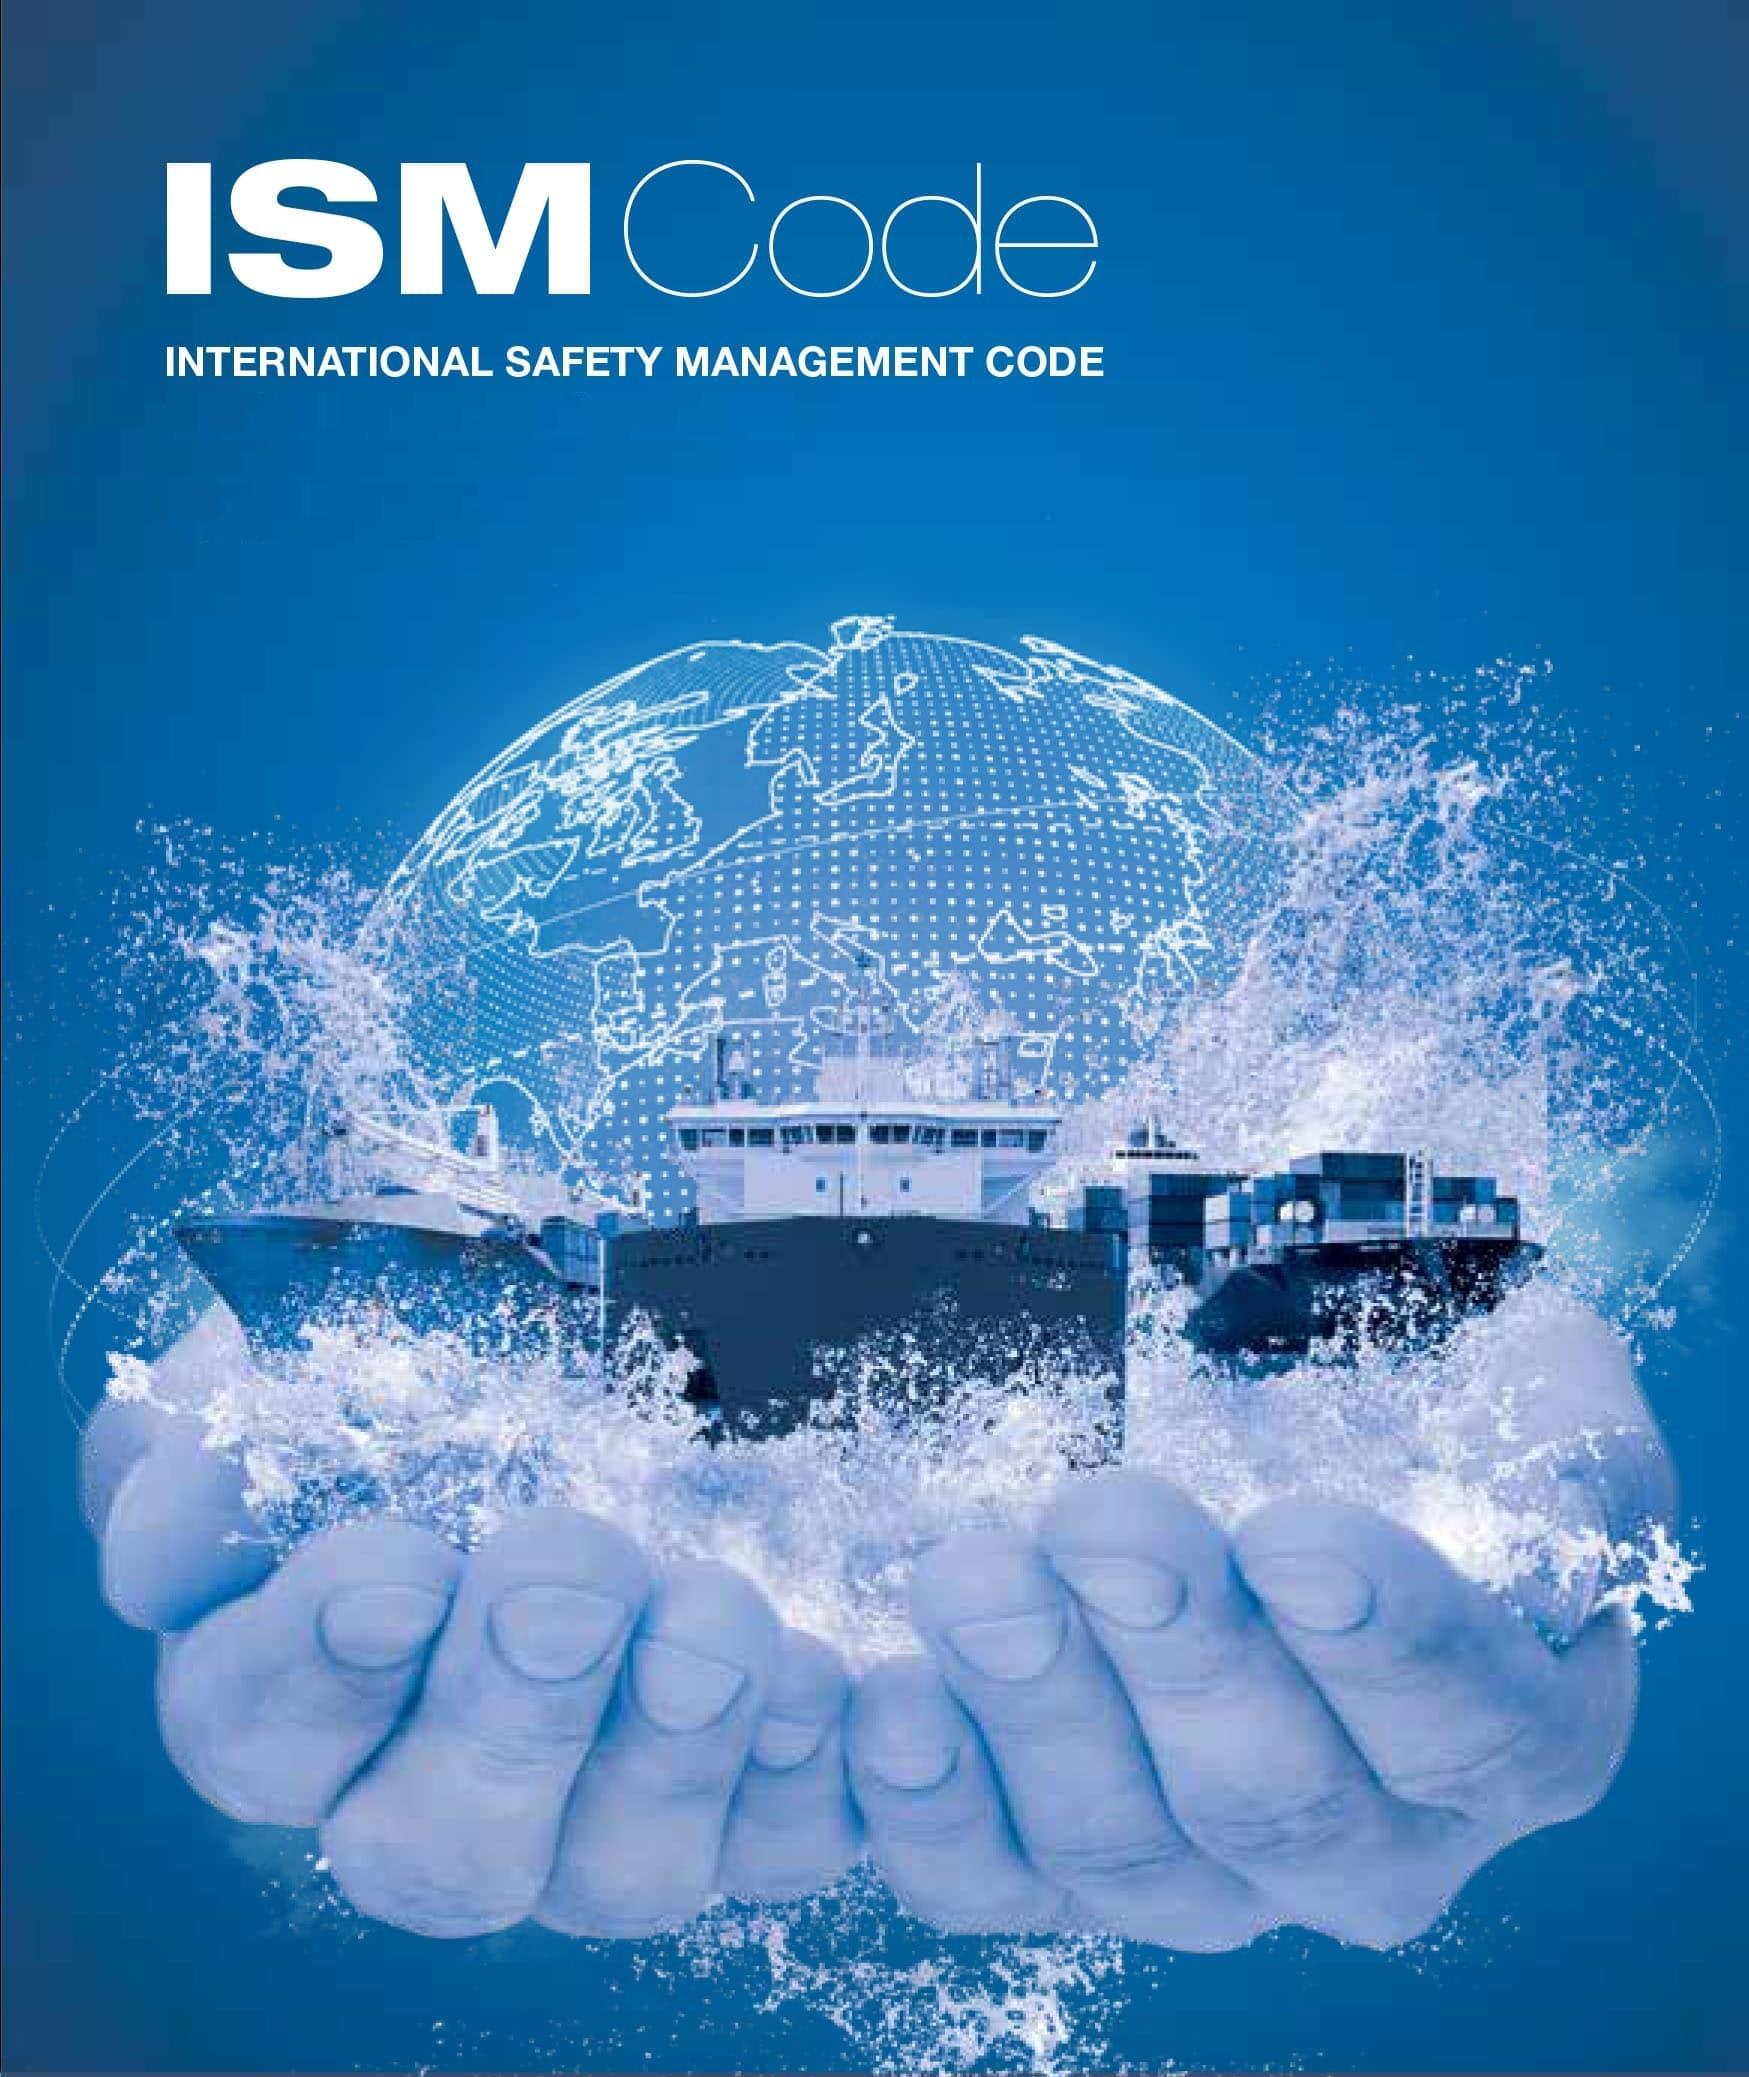 ISM Code Updates